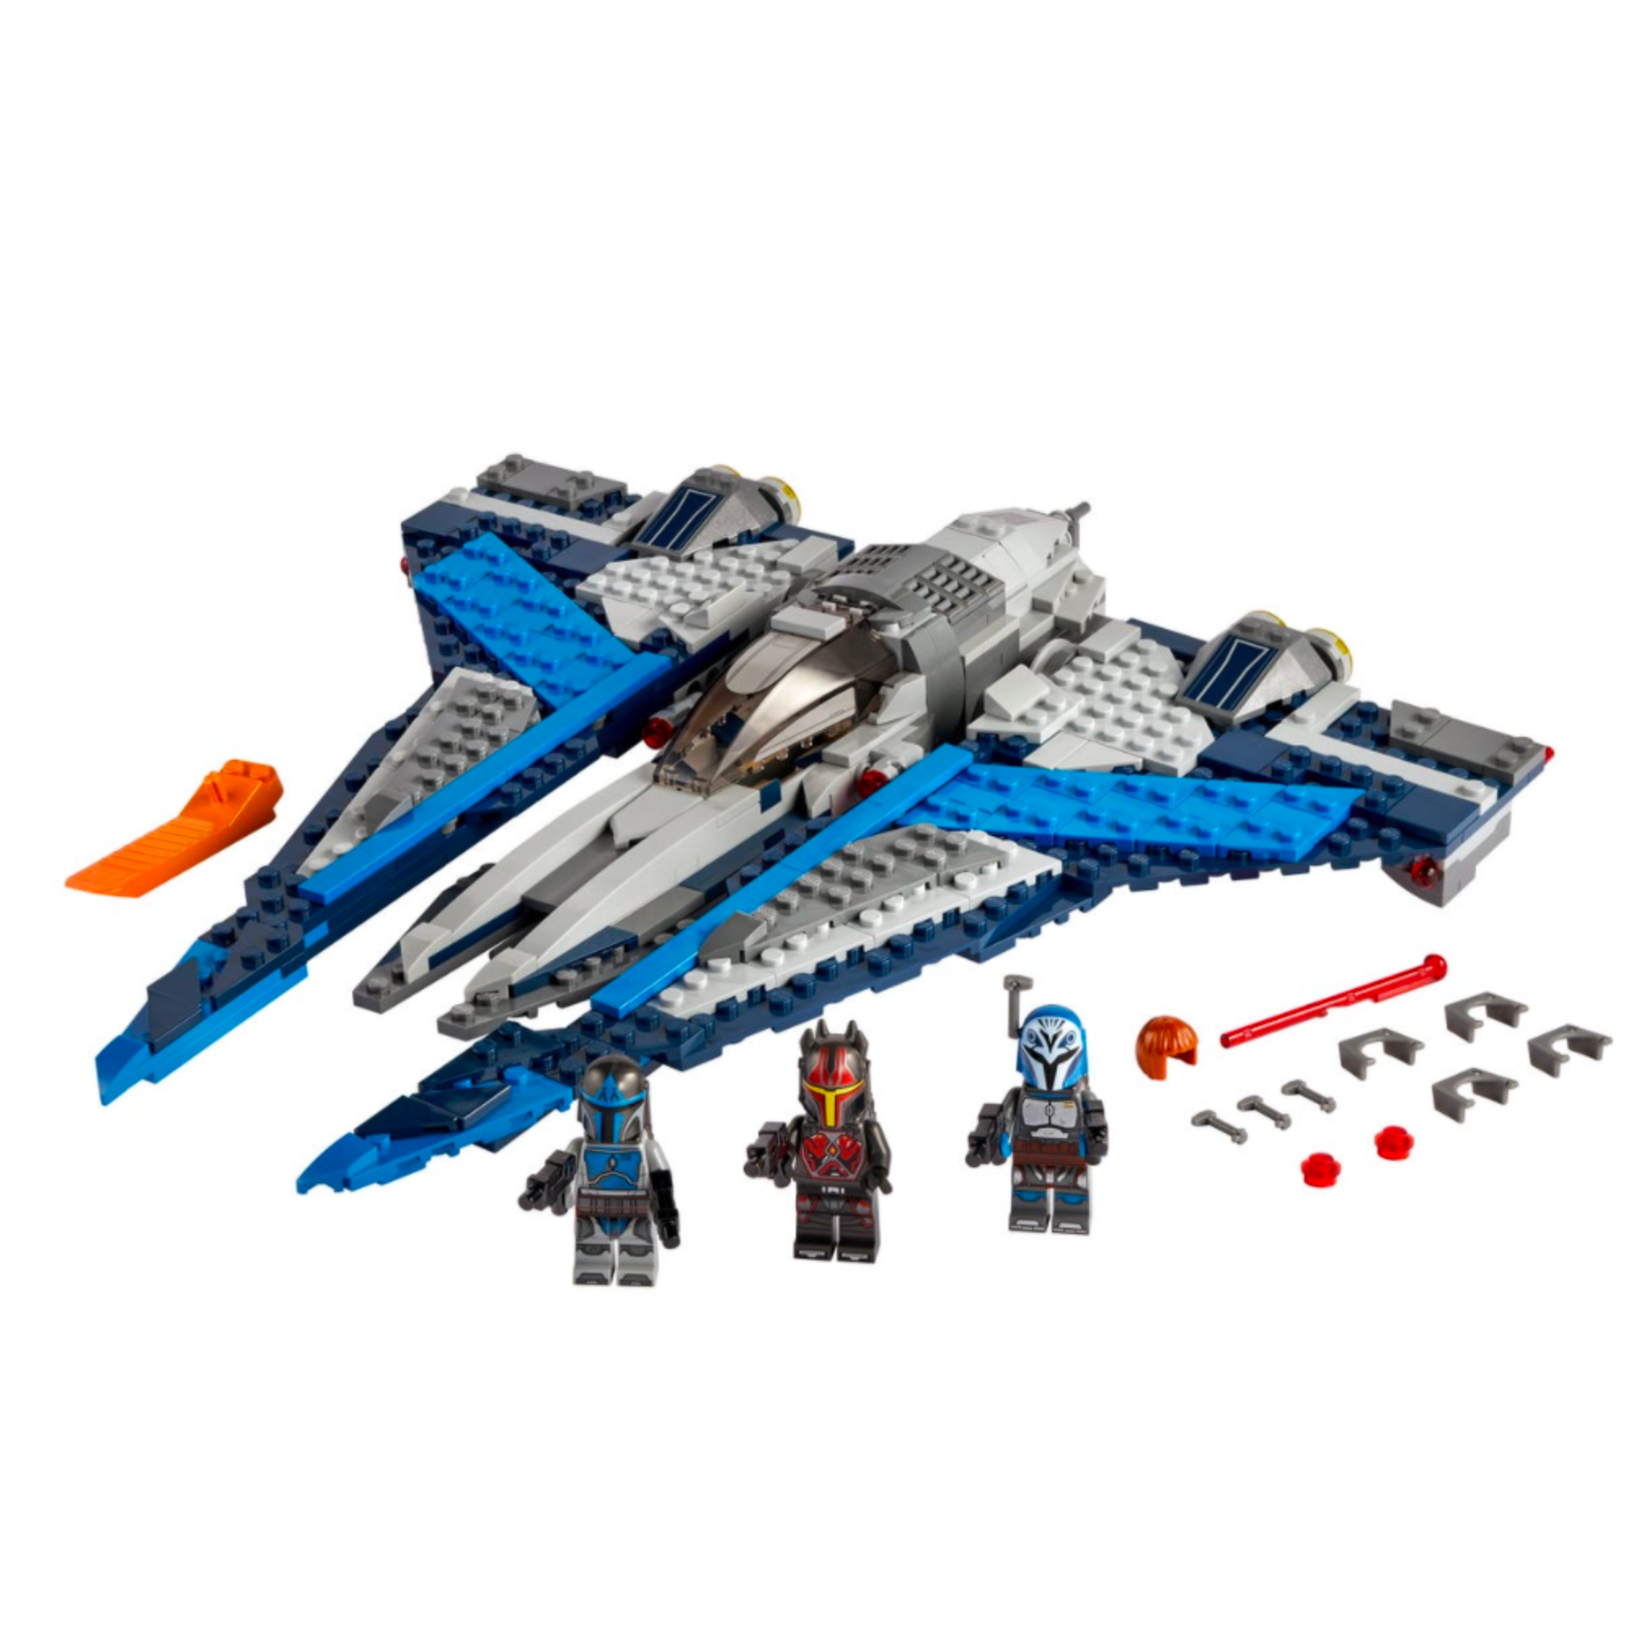 LEGO LEGO Star Wars Mandalorian Starfighter